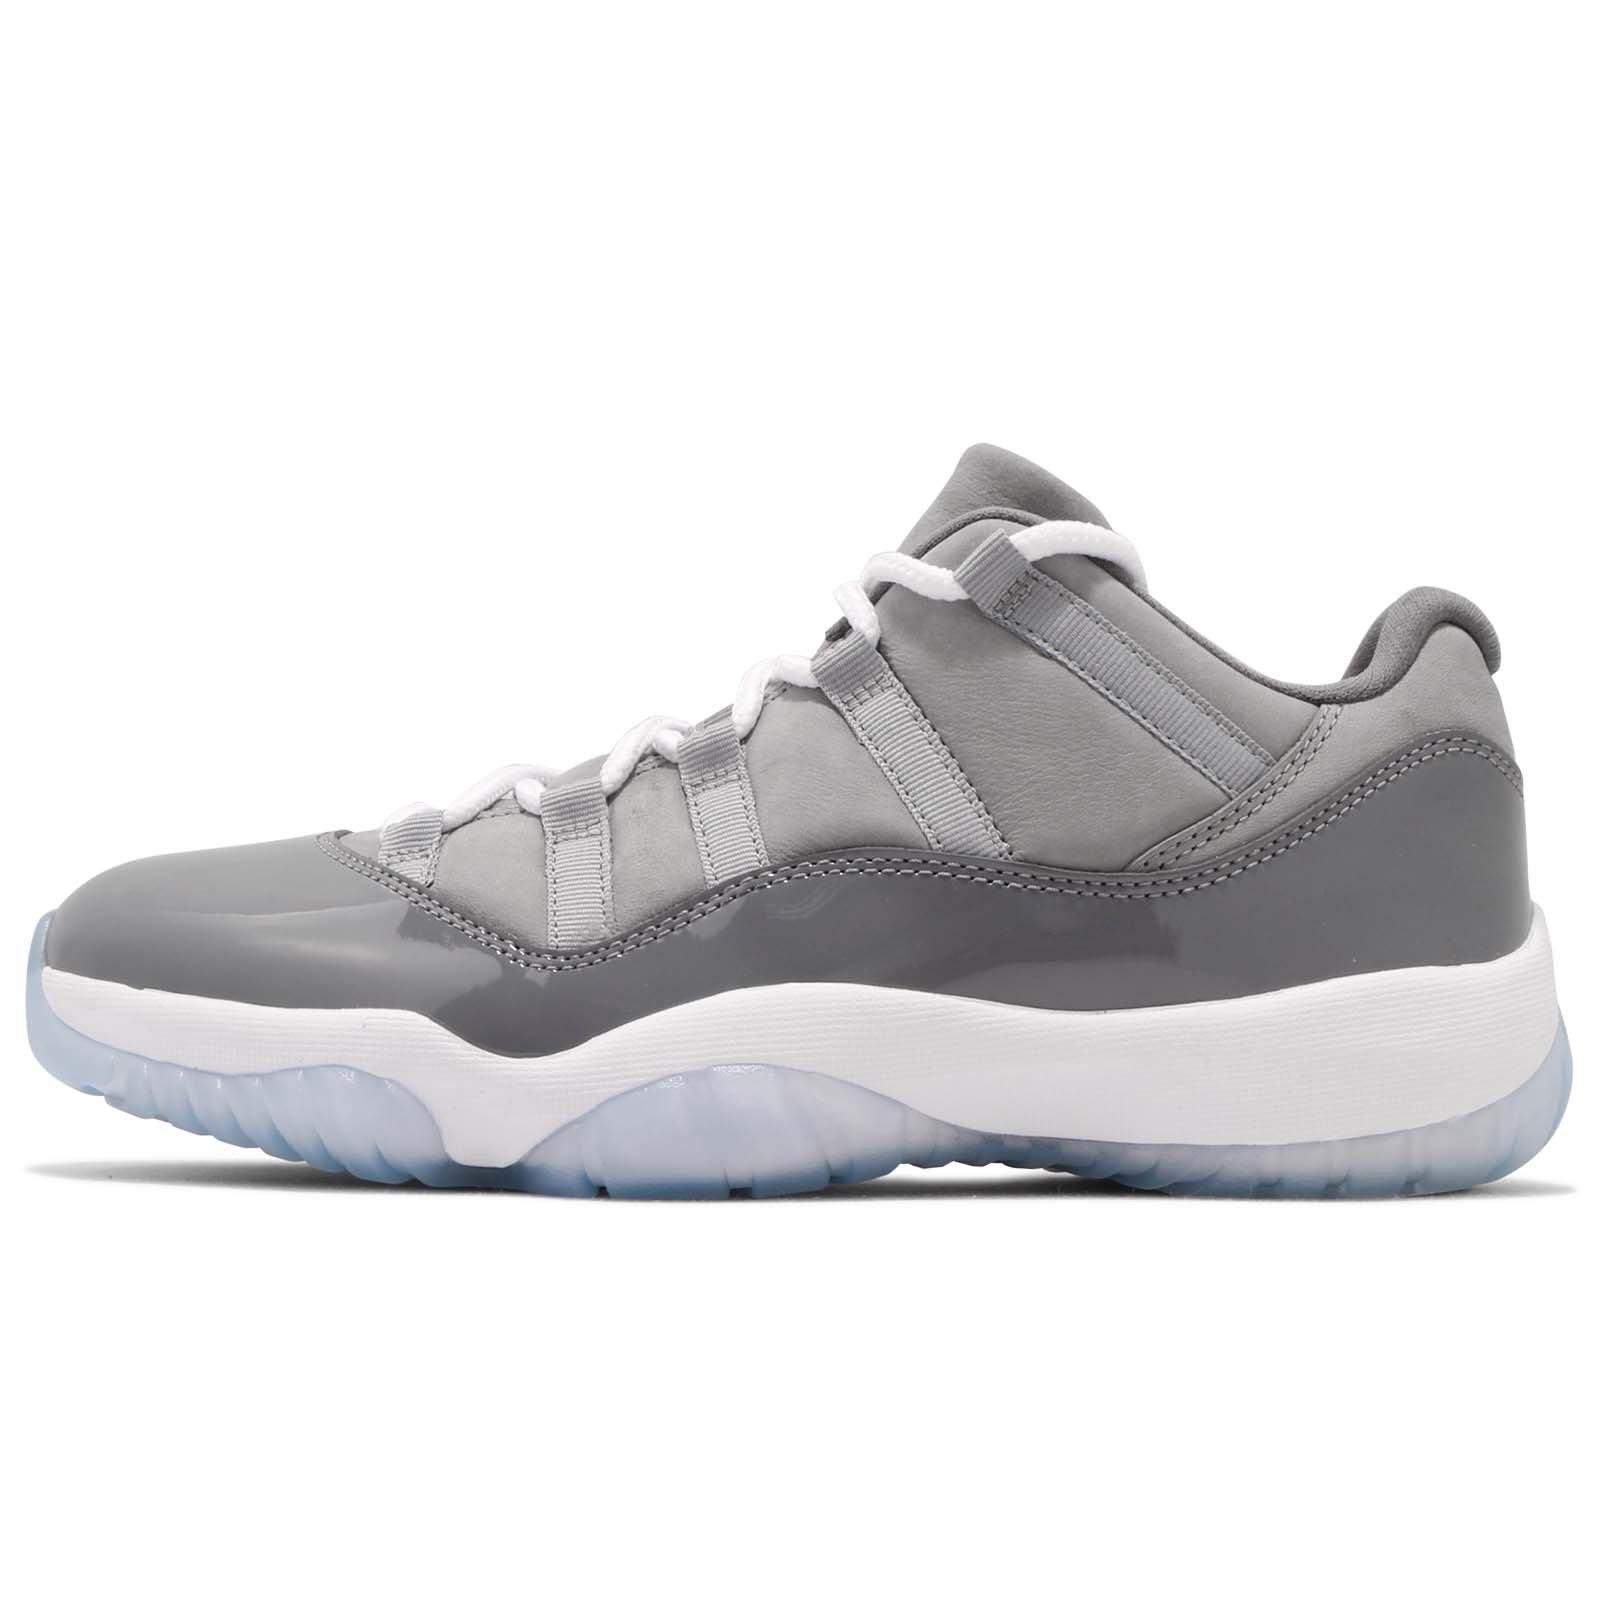 brand new 80151 13ede ... promo code for galleon nike air jordan retro 11 low cool grey mens  basketball shoes 8